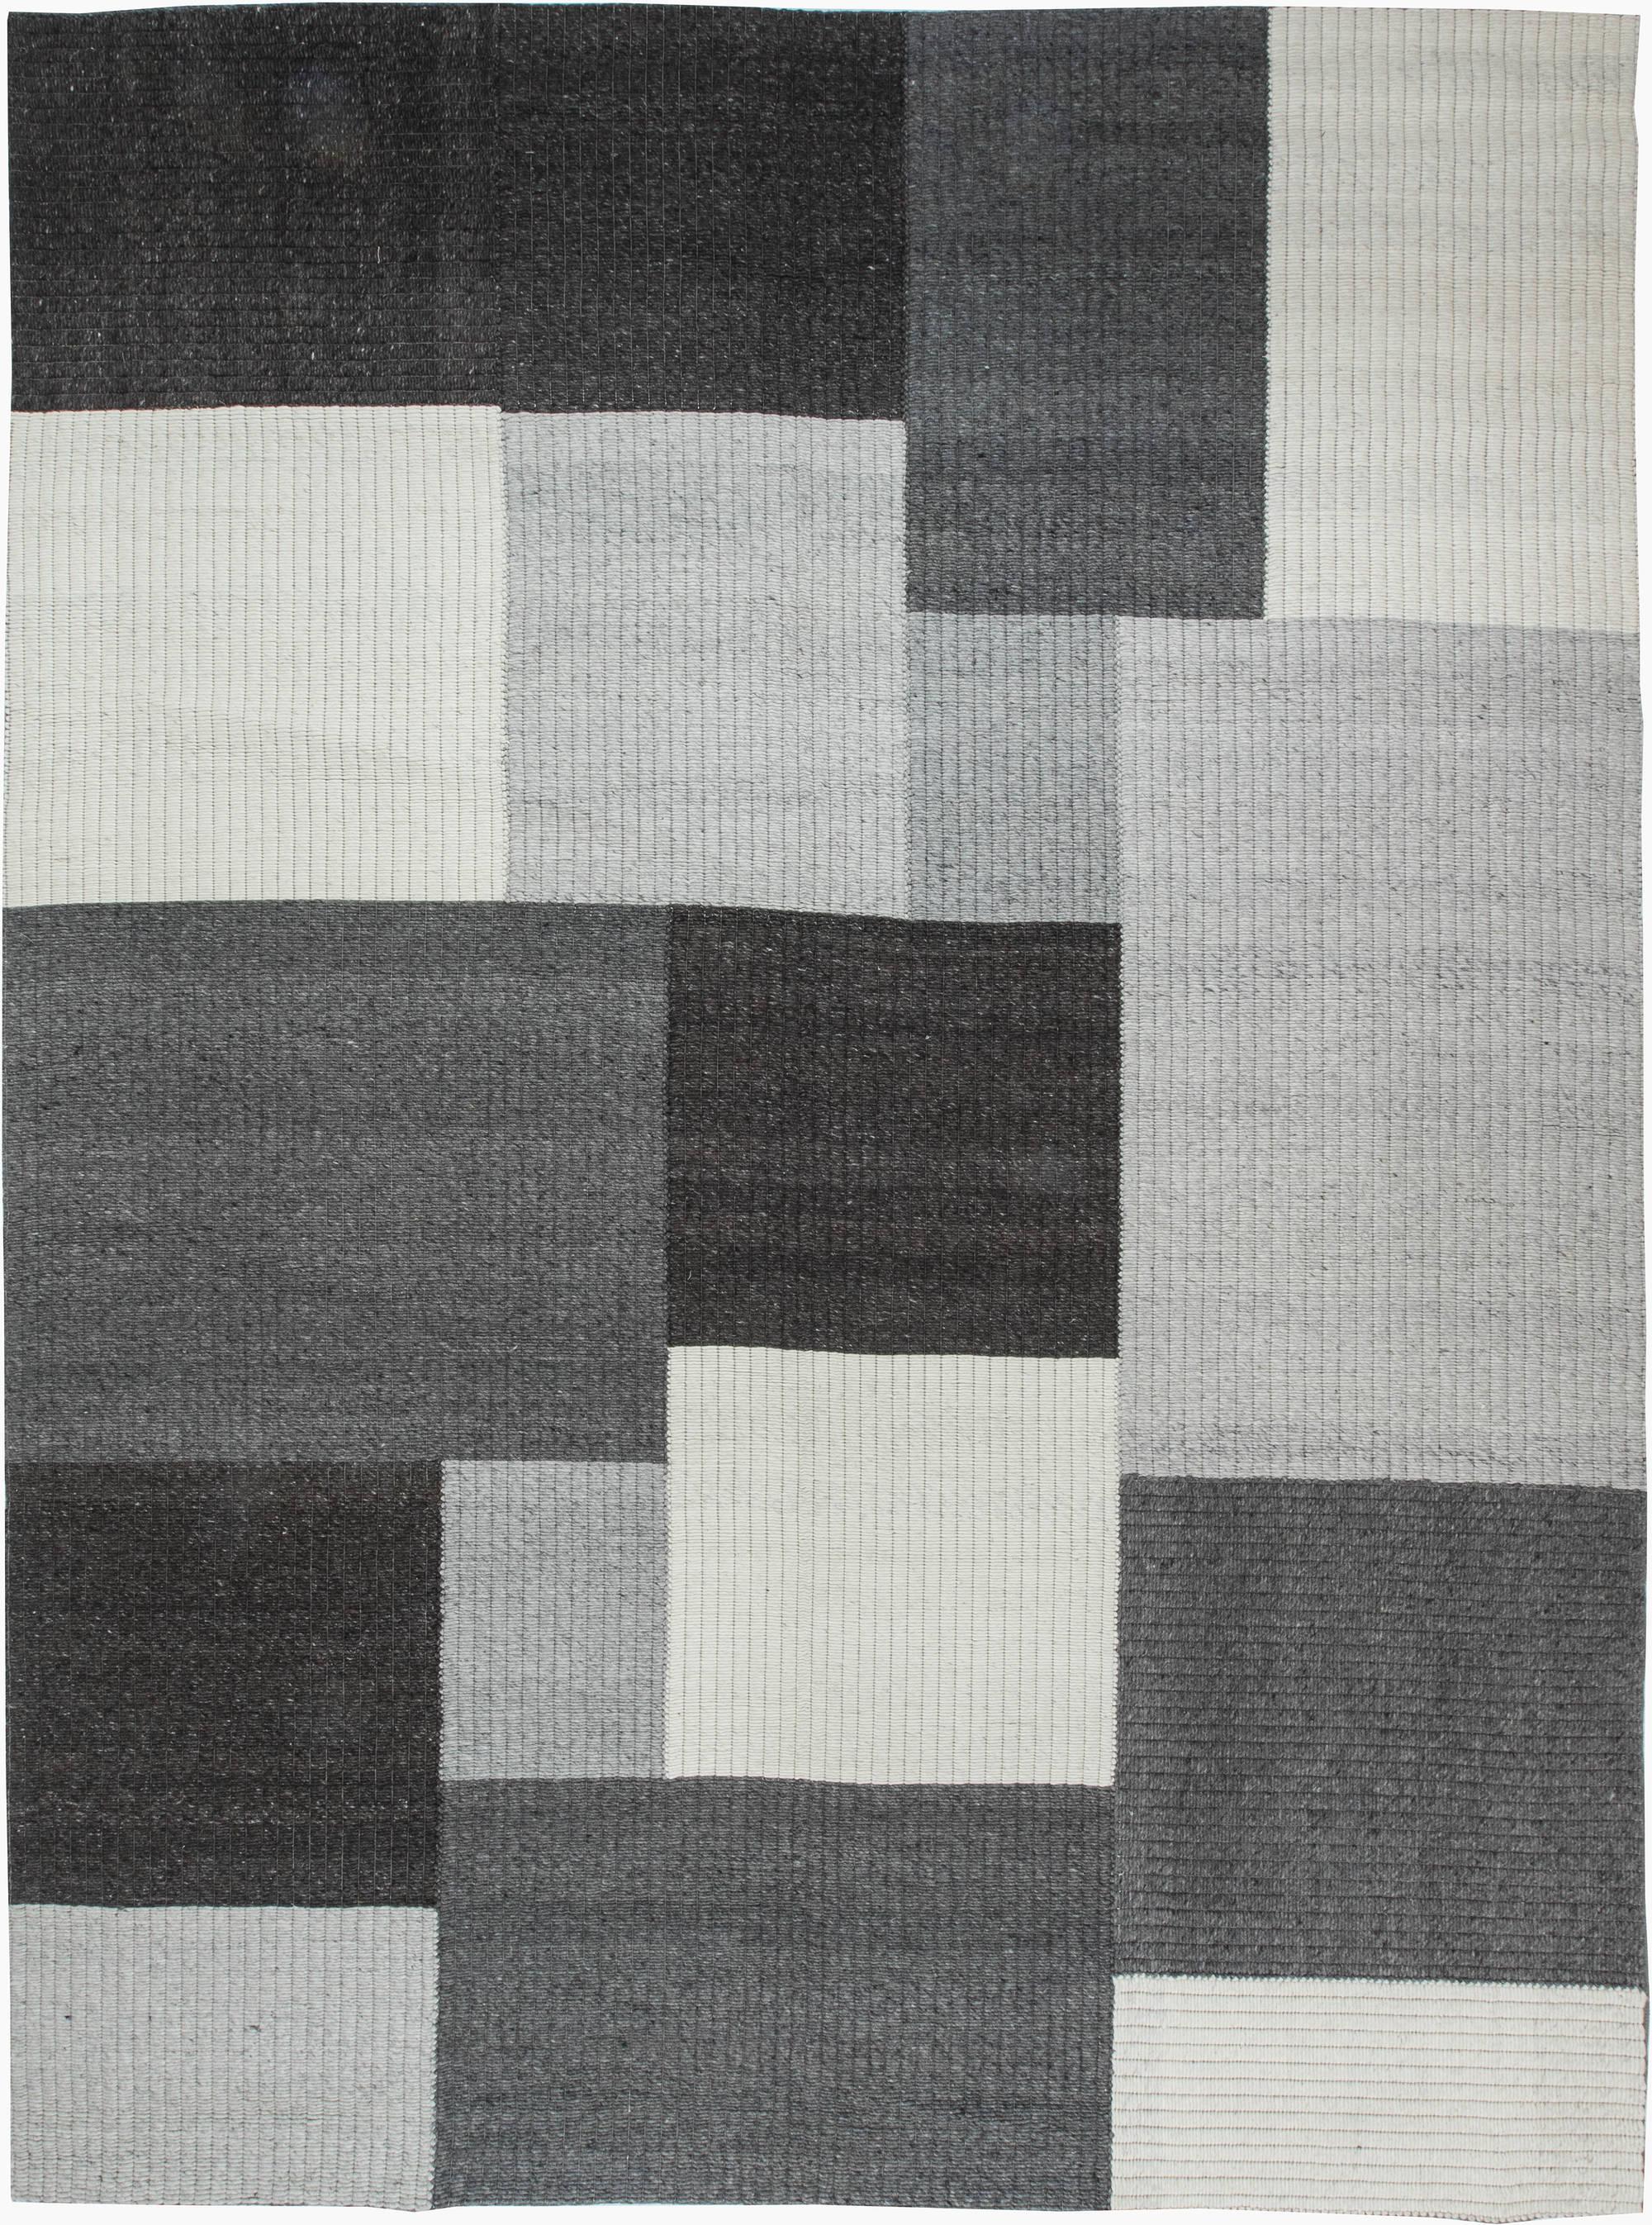 modern carpet design modern flat weave carpet n11587. arrow down  47161db02bae4ef92bdede423862e8f0c2b91f81311572b5a8bb90eef3001a34 XJHACKK